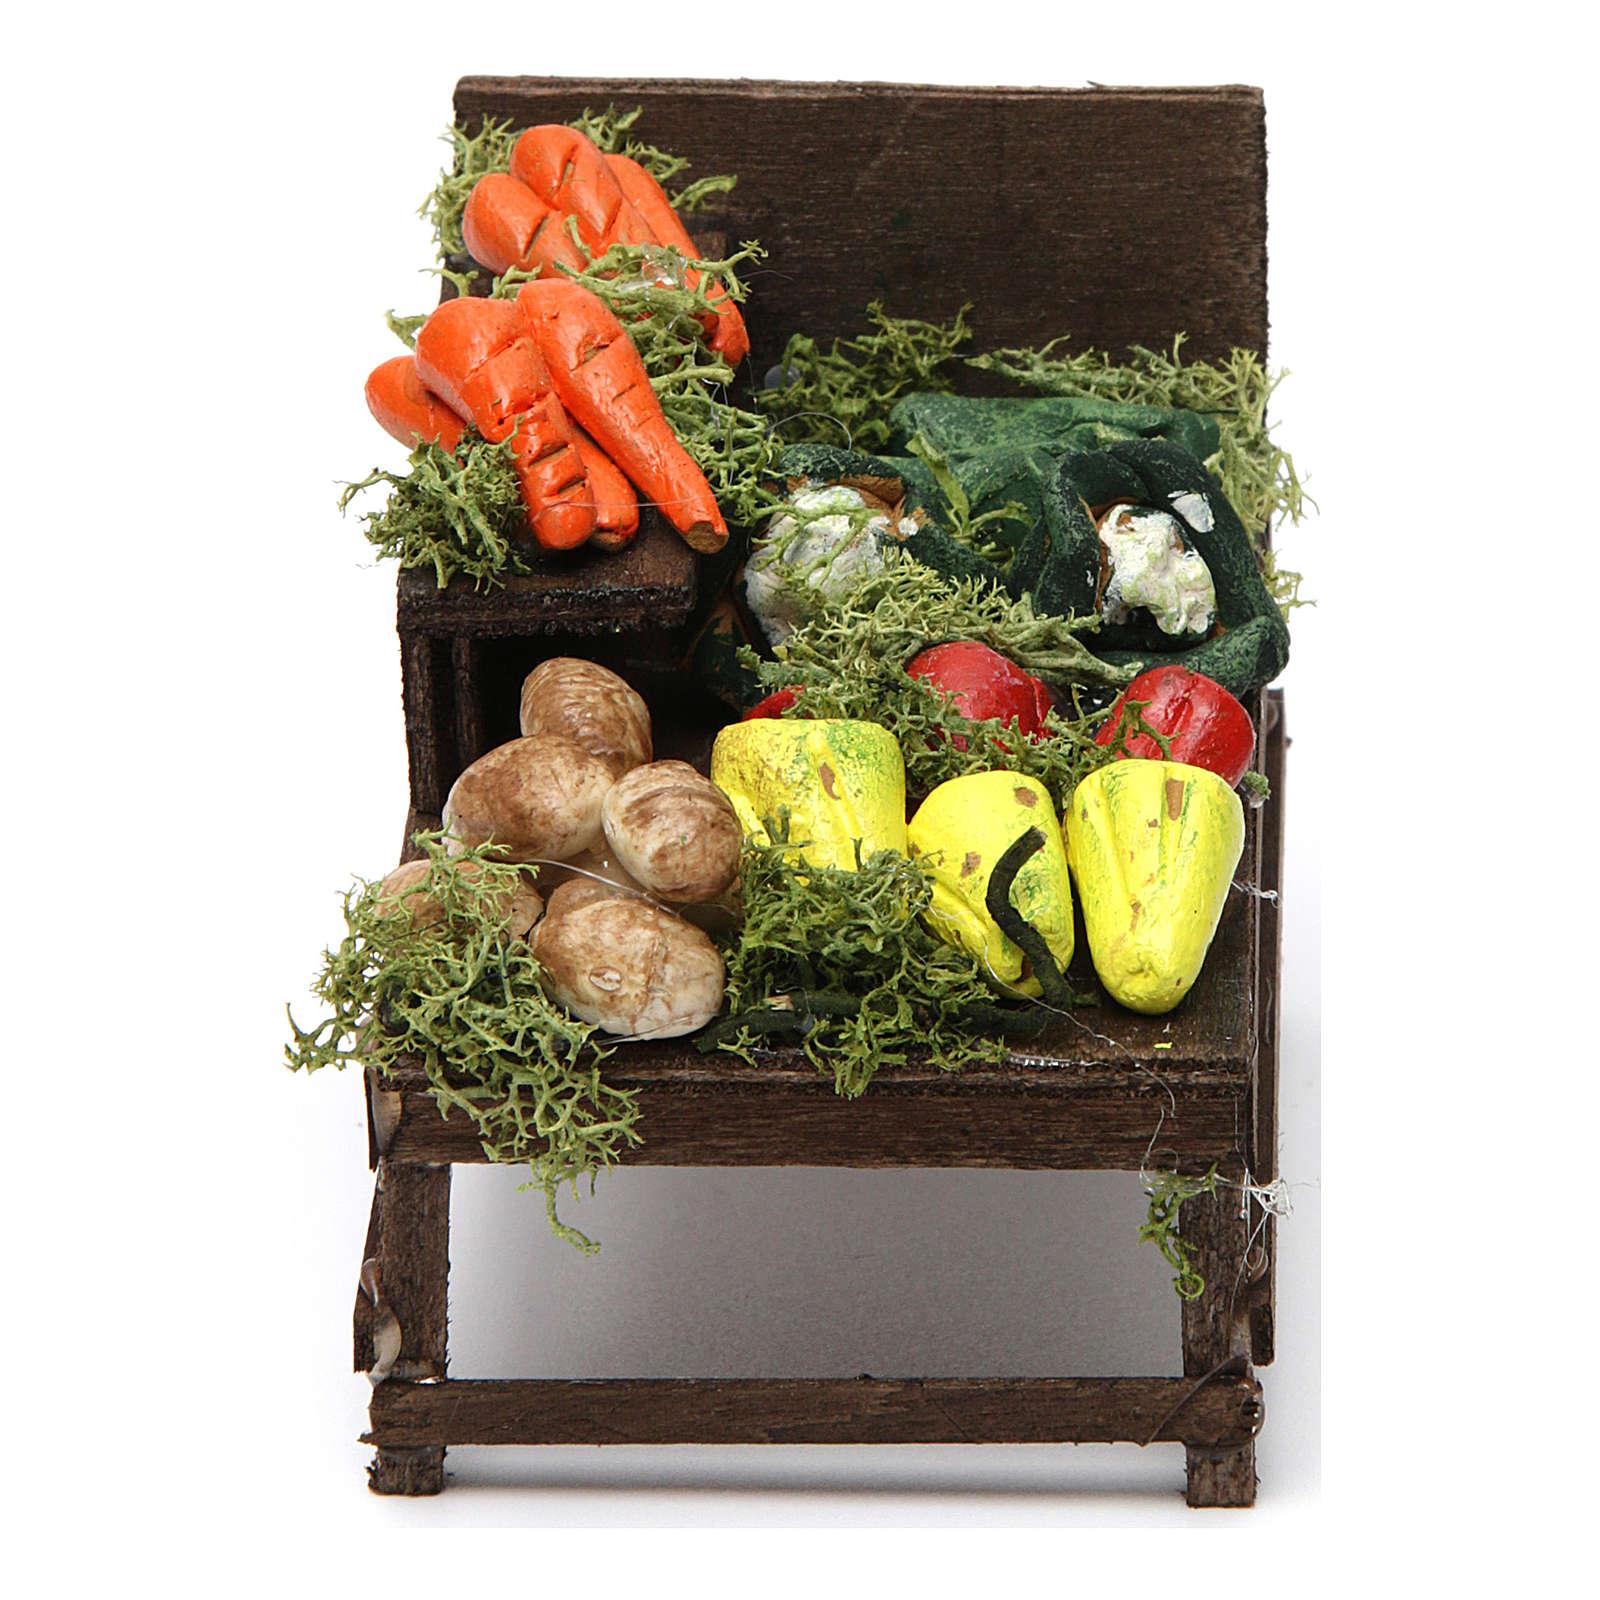 Banchetto legno verdura terracotta presepe 4